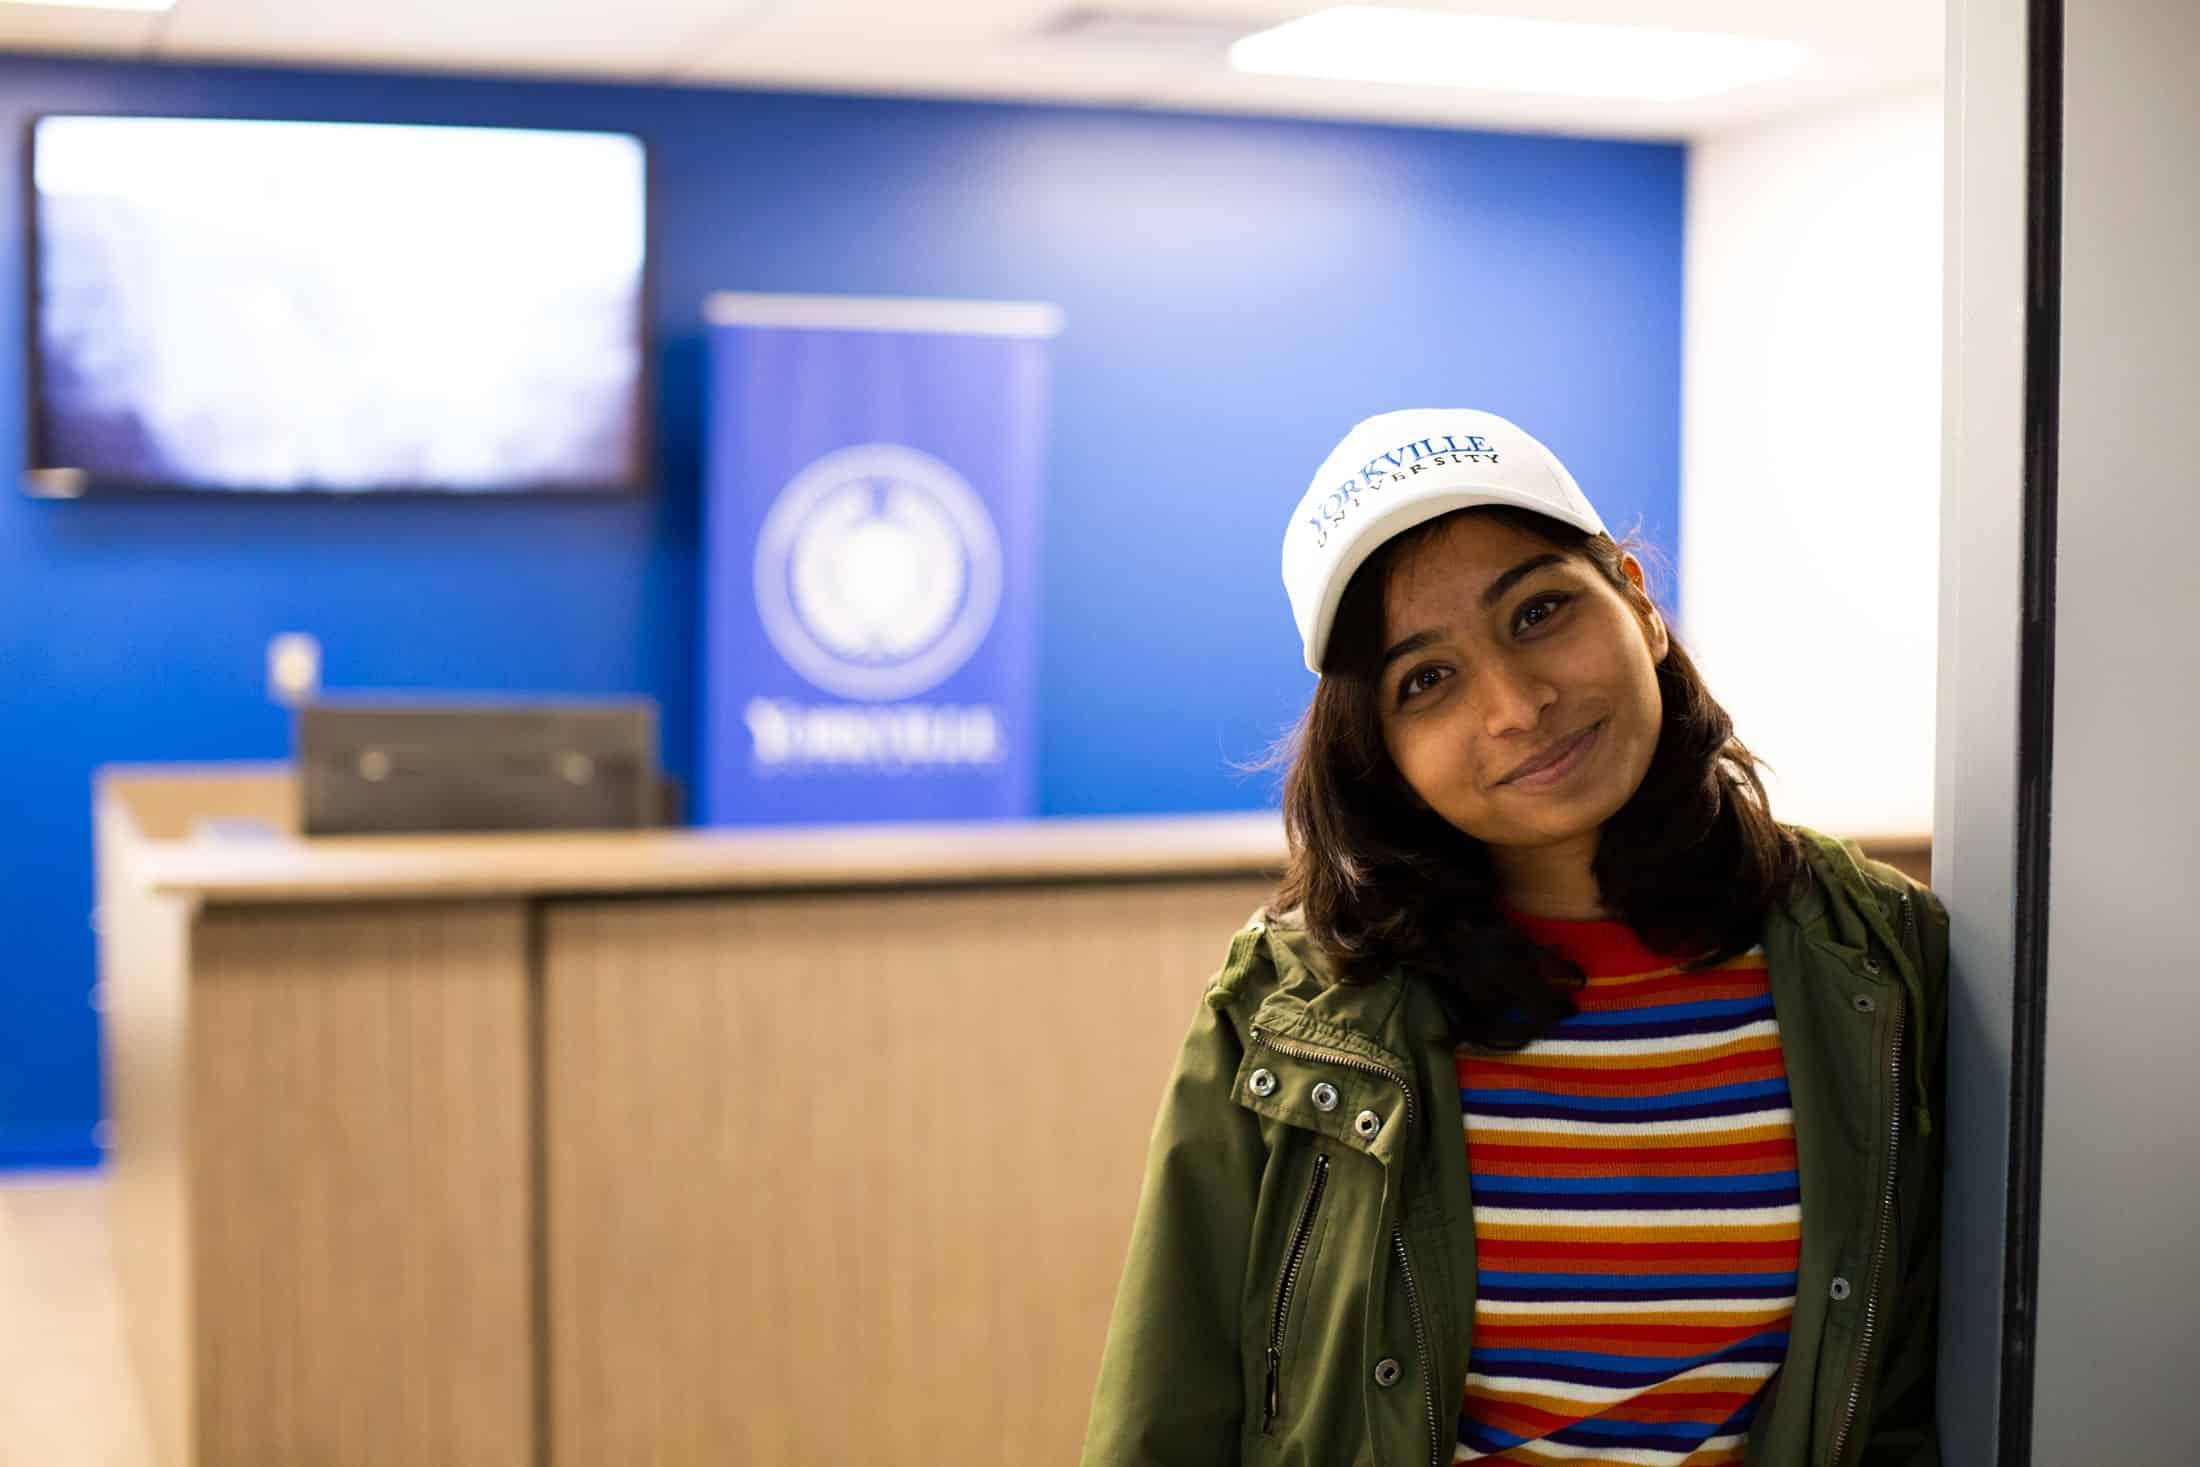 Photograph of Yorkville University student